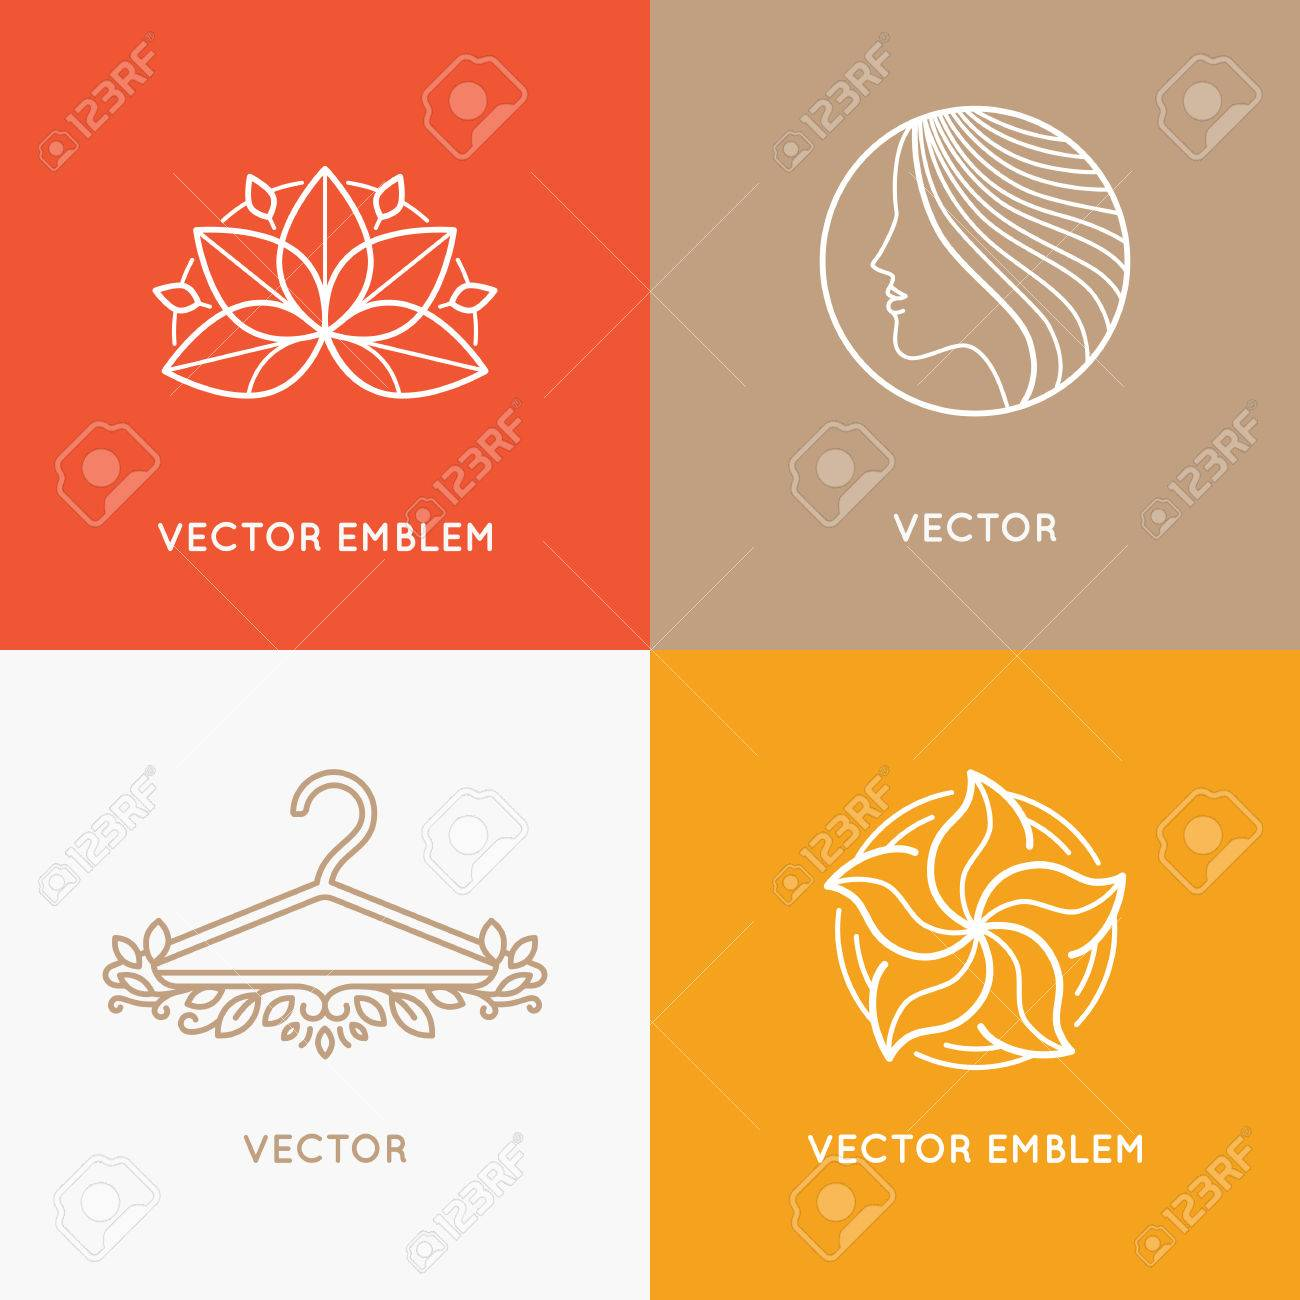 set of icon design templates and emblems fashion stylist and rh 123rf com Stylist Heart Vector Hair Stylist Vector